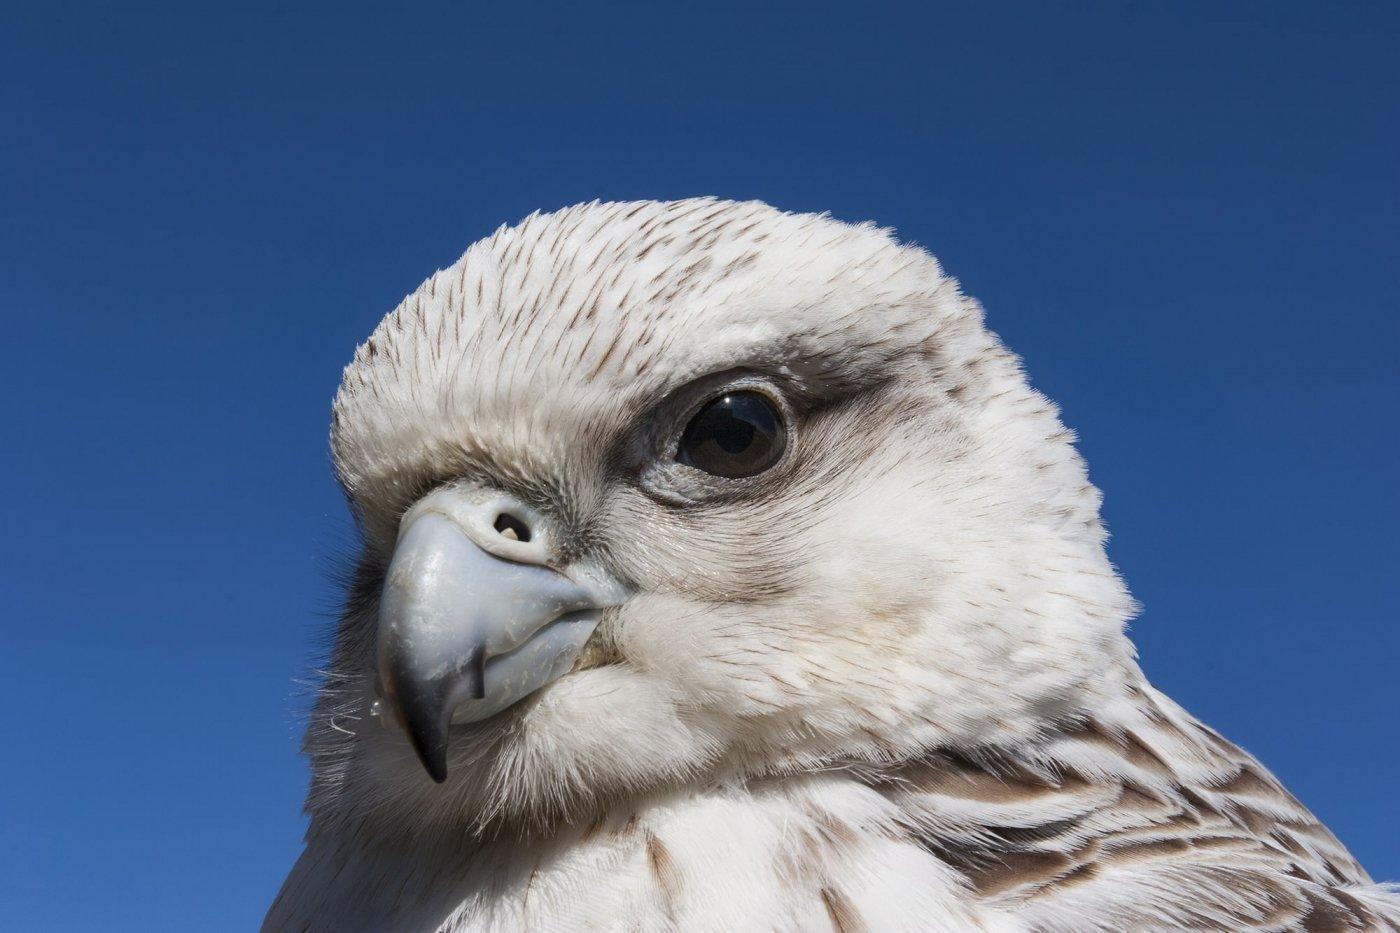 Gyrfalcon -EN, Kissaviarsuk -KAL, Jagtfalk -DA, Falco rusticolus -LAT. Photo by Carsten Egevang - Visit Greenland